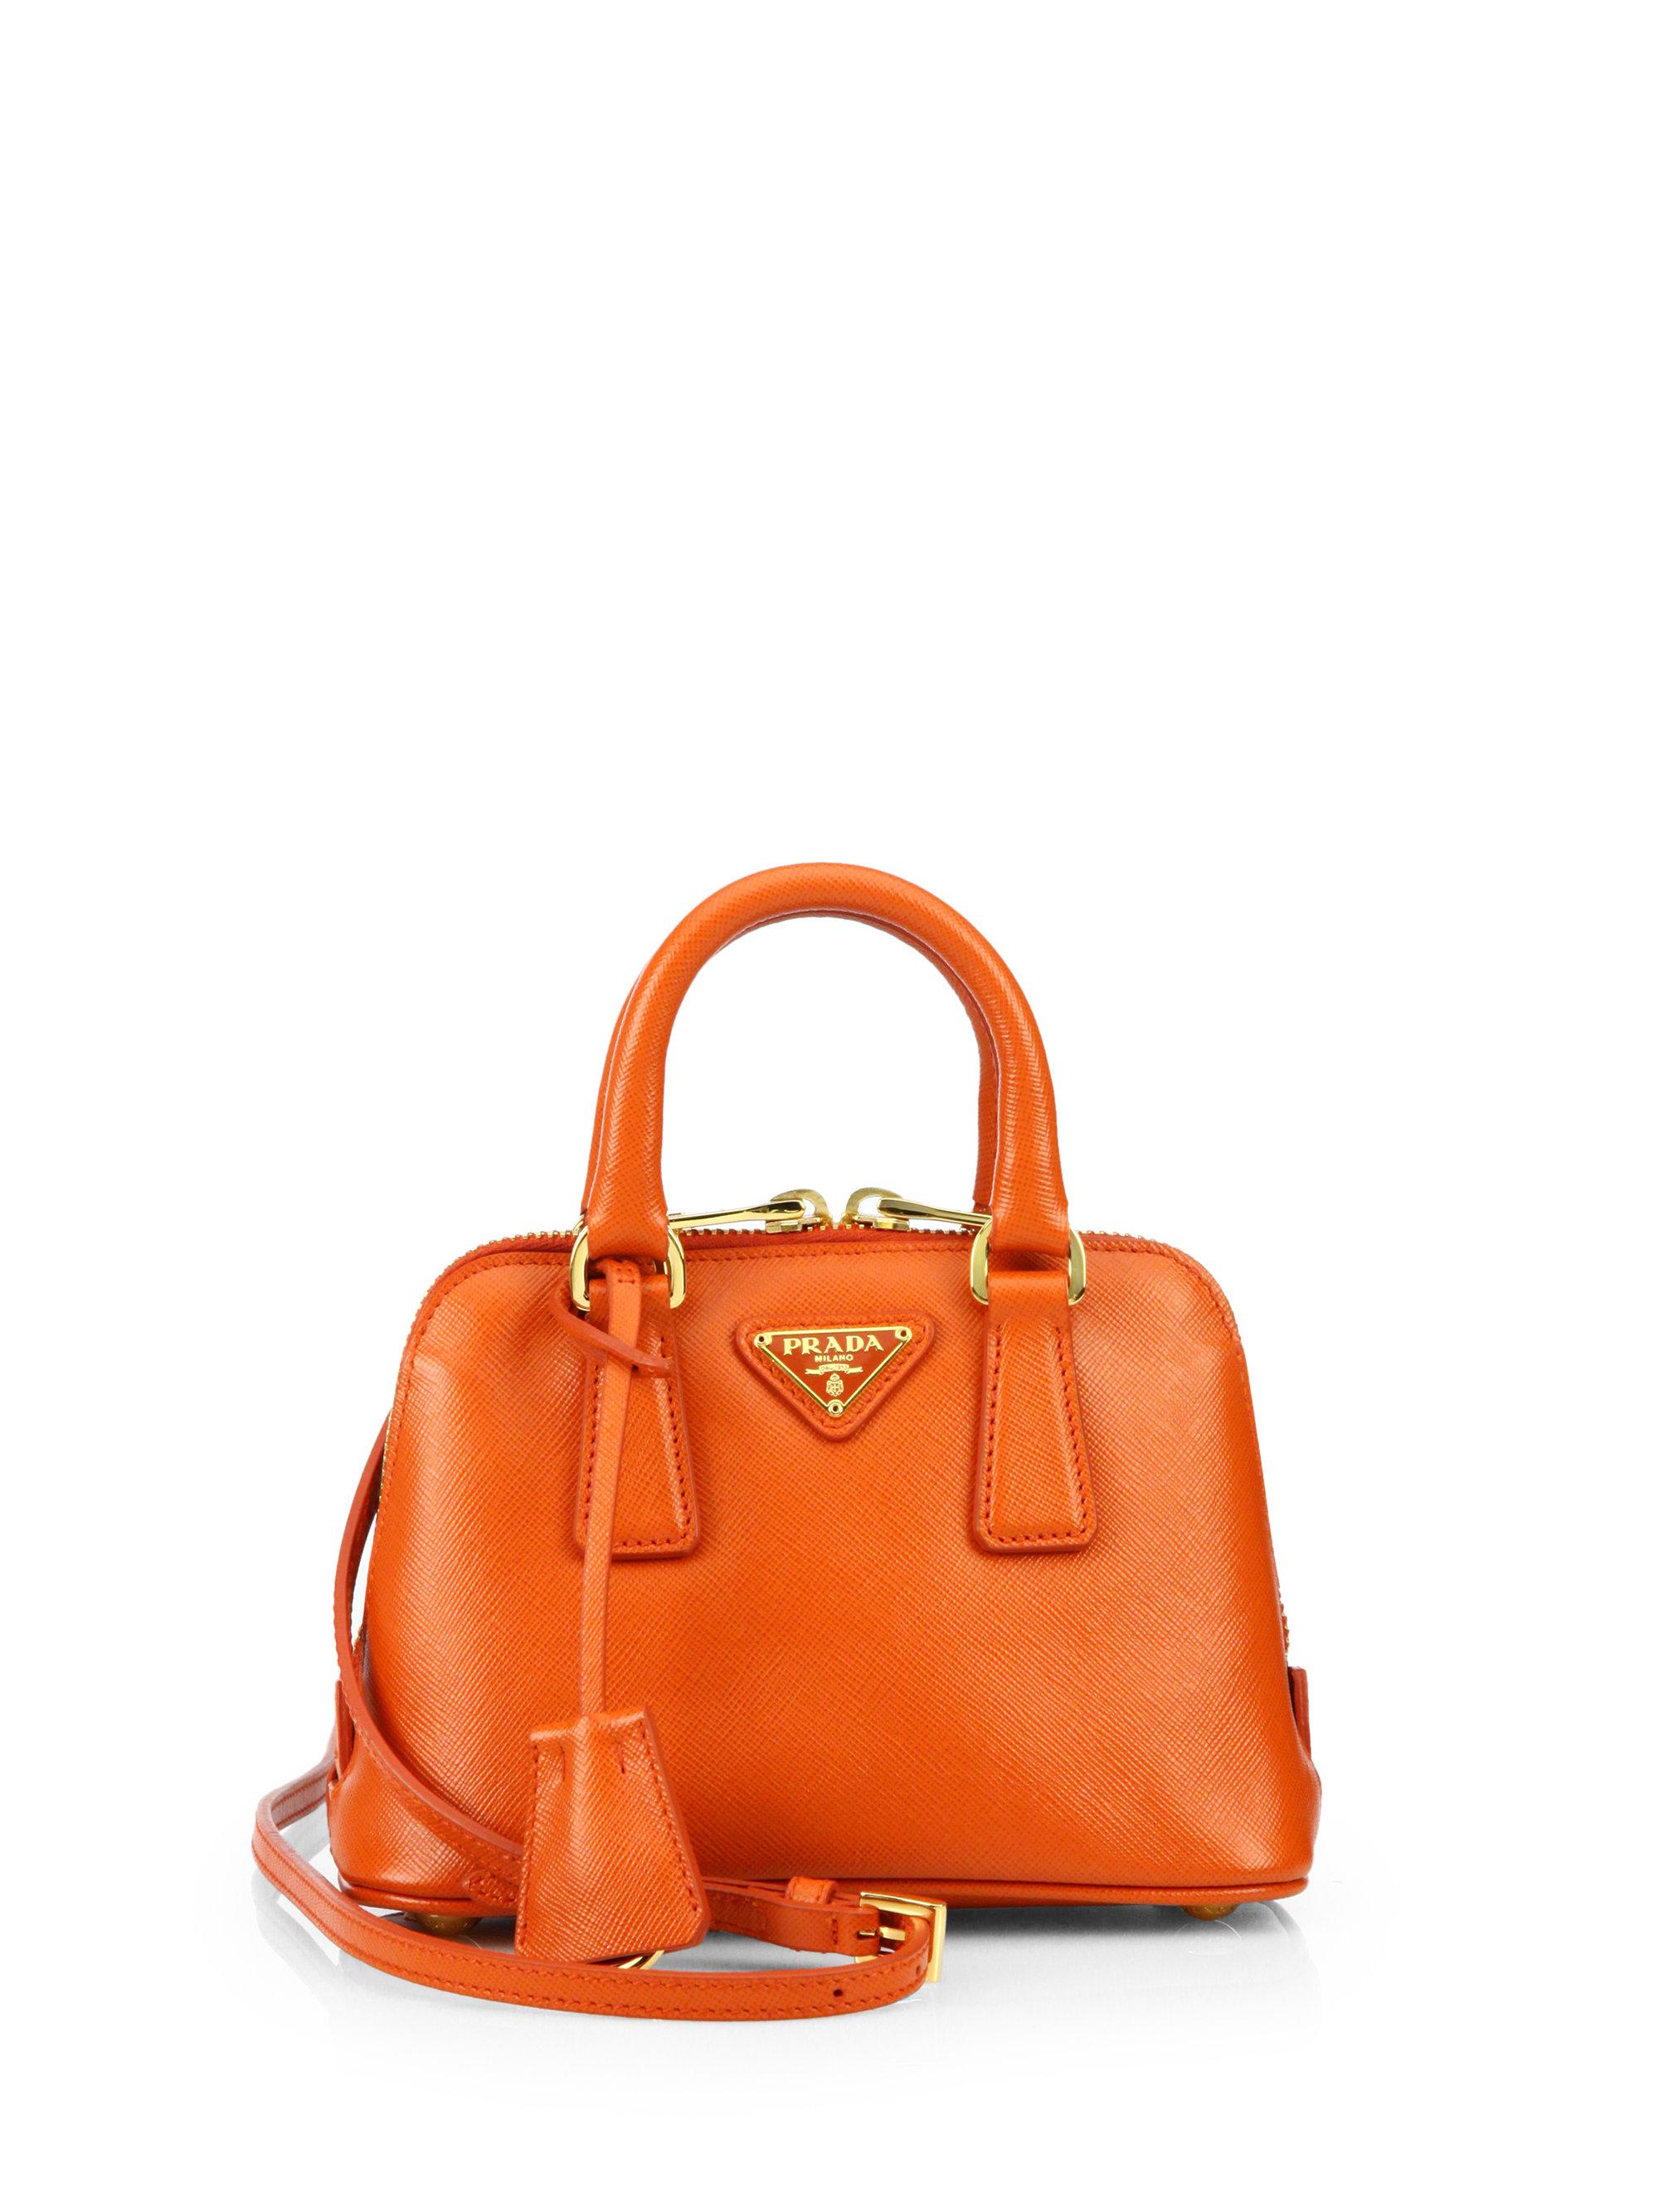 86f4f74143ba get lyst prada python chain bag 43576 db680  get lyst prada saffiano lux  double handle mini satchel in orange 6e7e0 d99c7